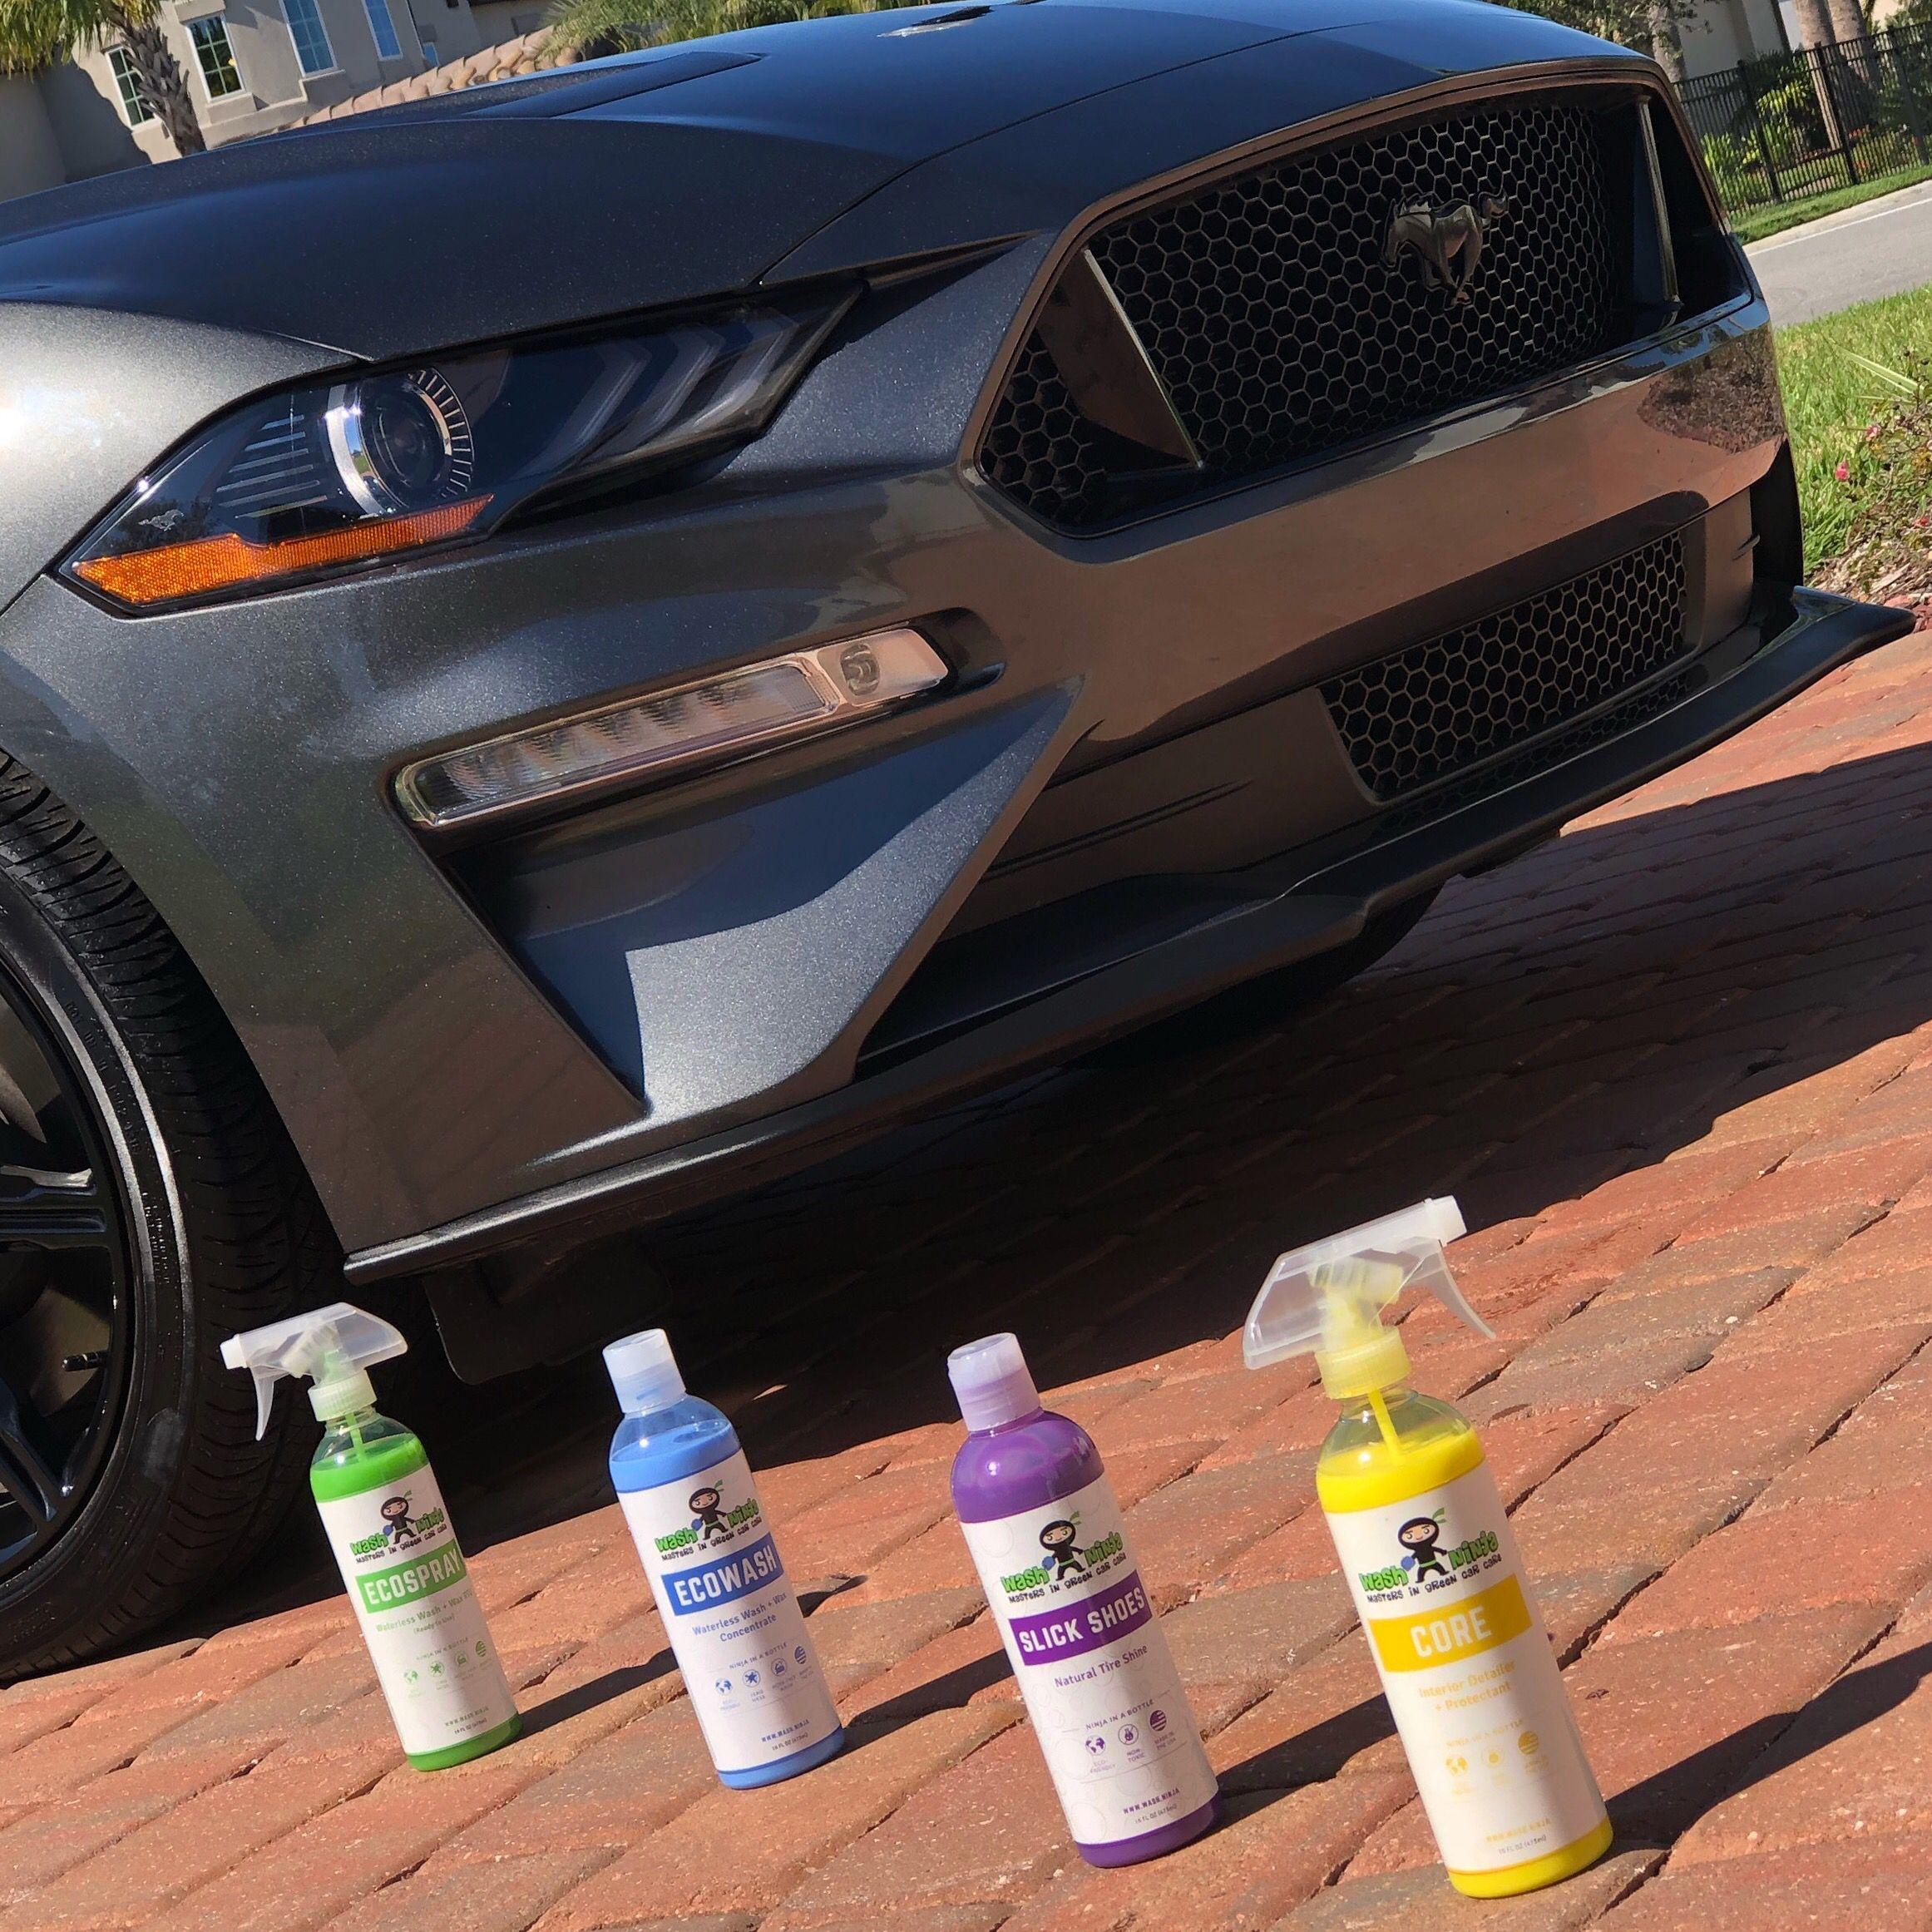 Waterless Car Wash Eco Friendly Detailing Products Wash Ninja Waterless Car Wash Car Wash Eco Friendly Cars